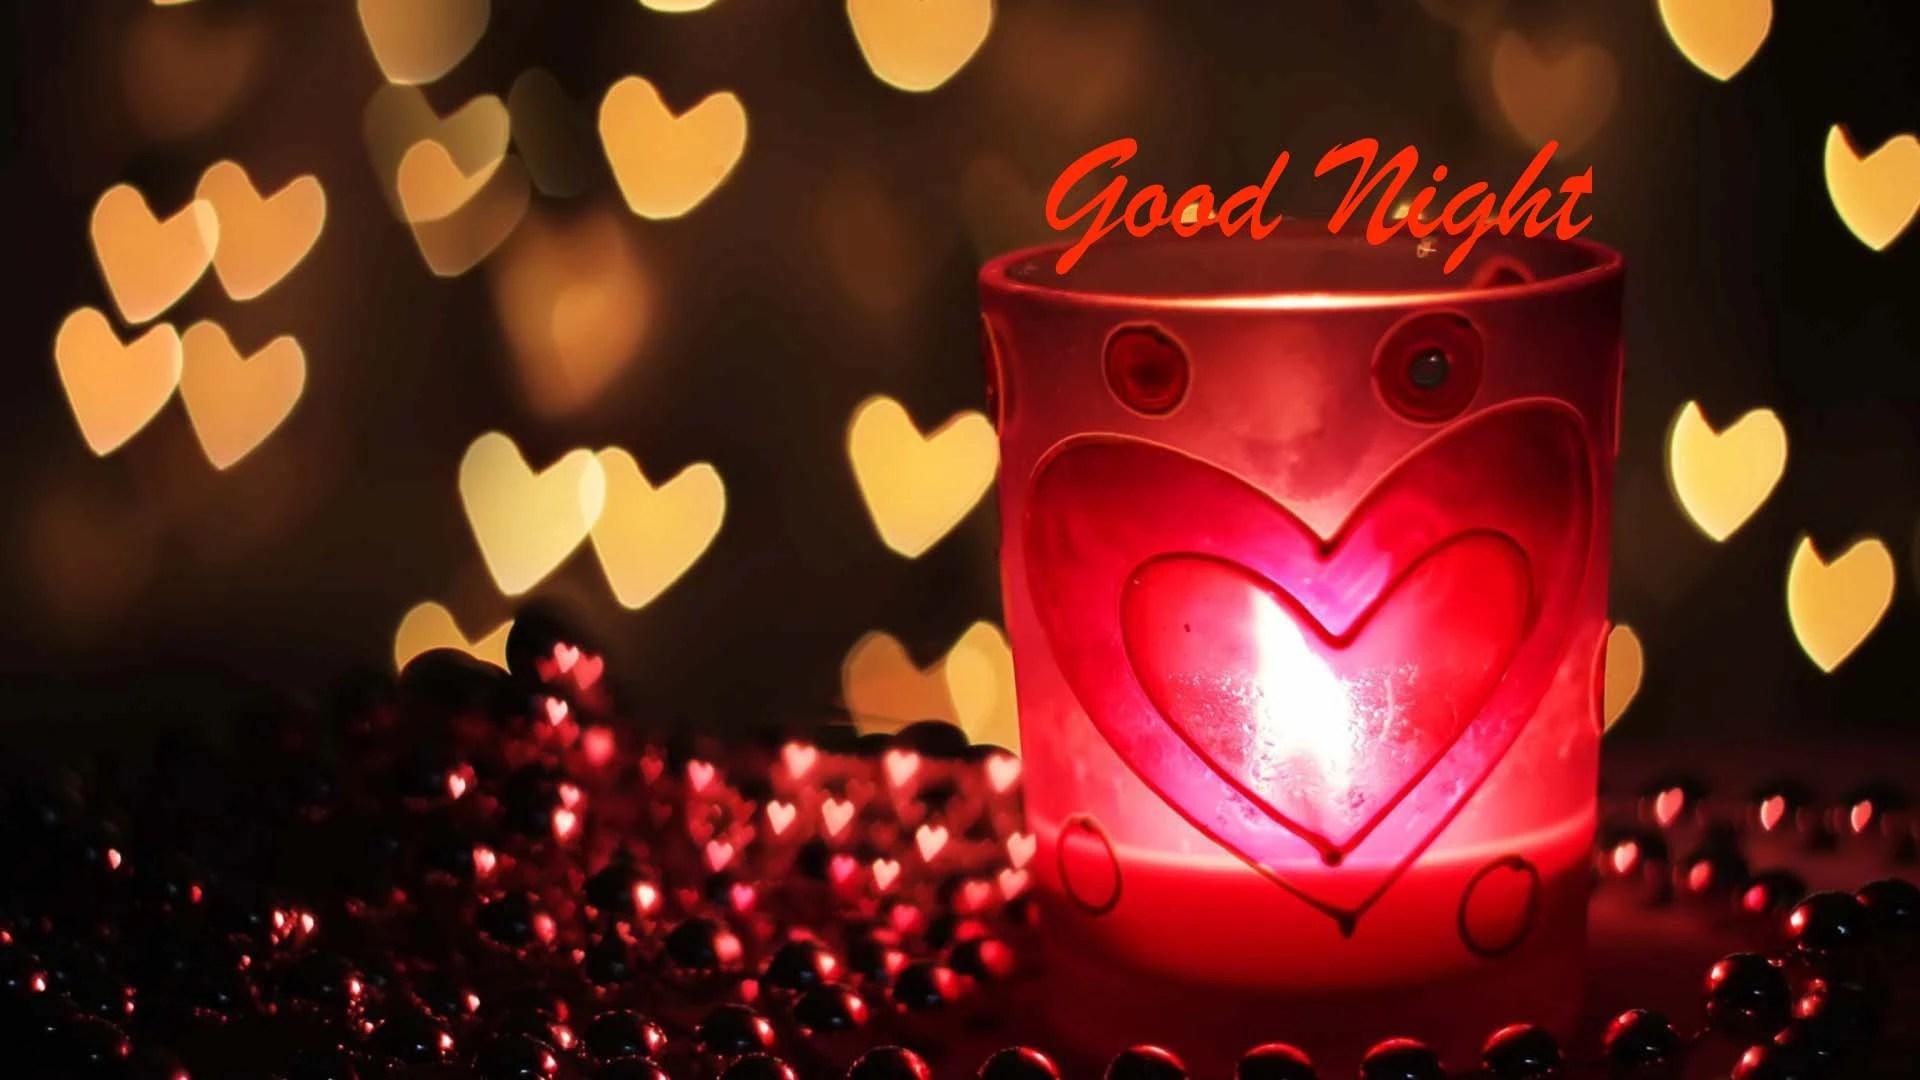 Good night heart red image